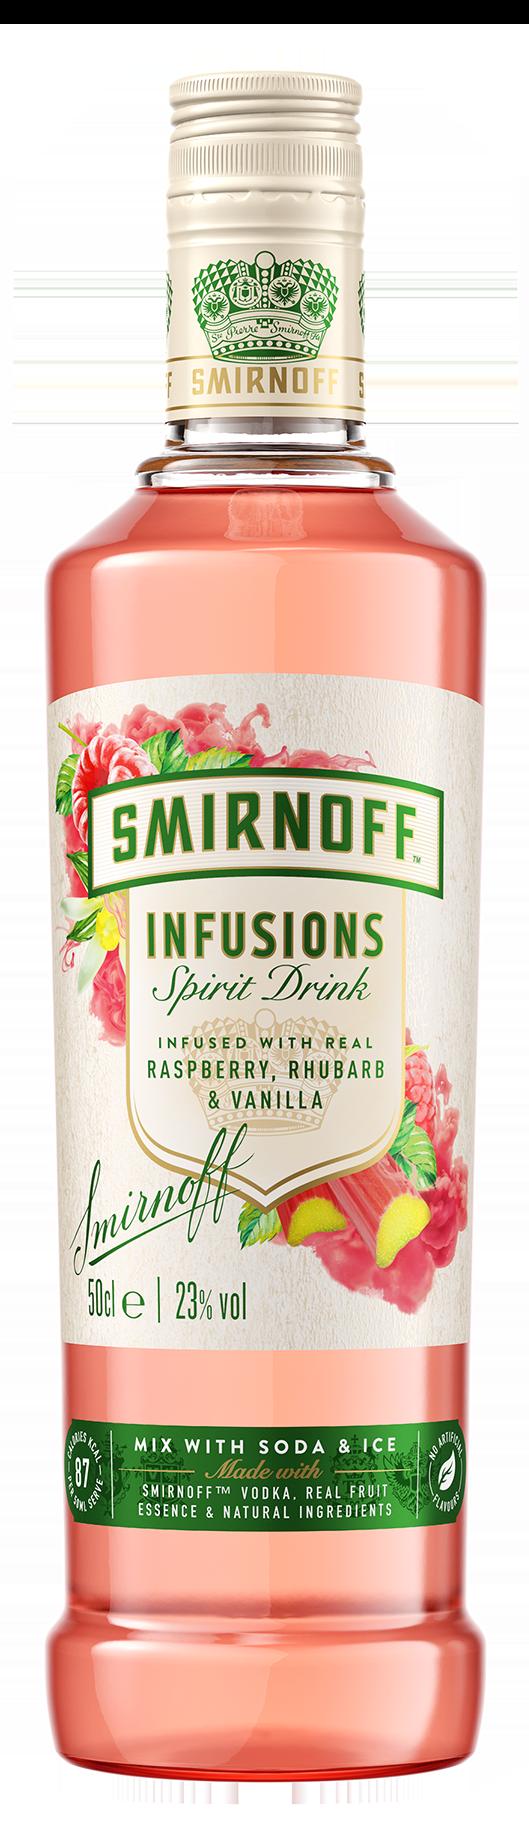 Smirnoff Infusions Raspberry & Rhubarb